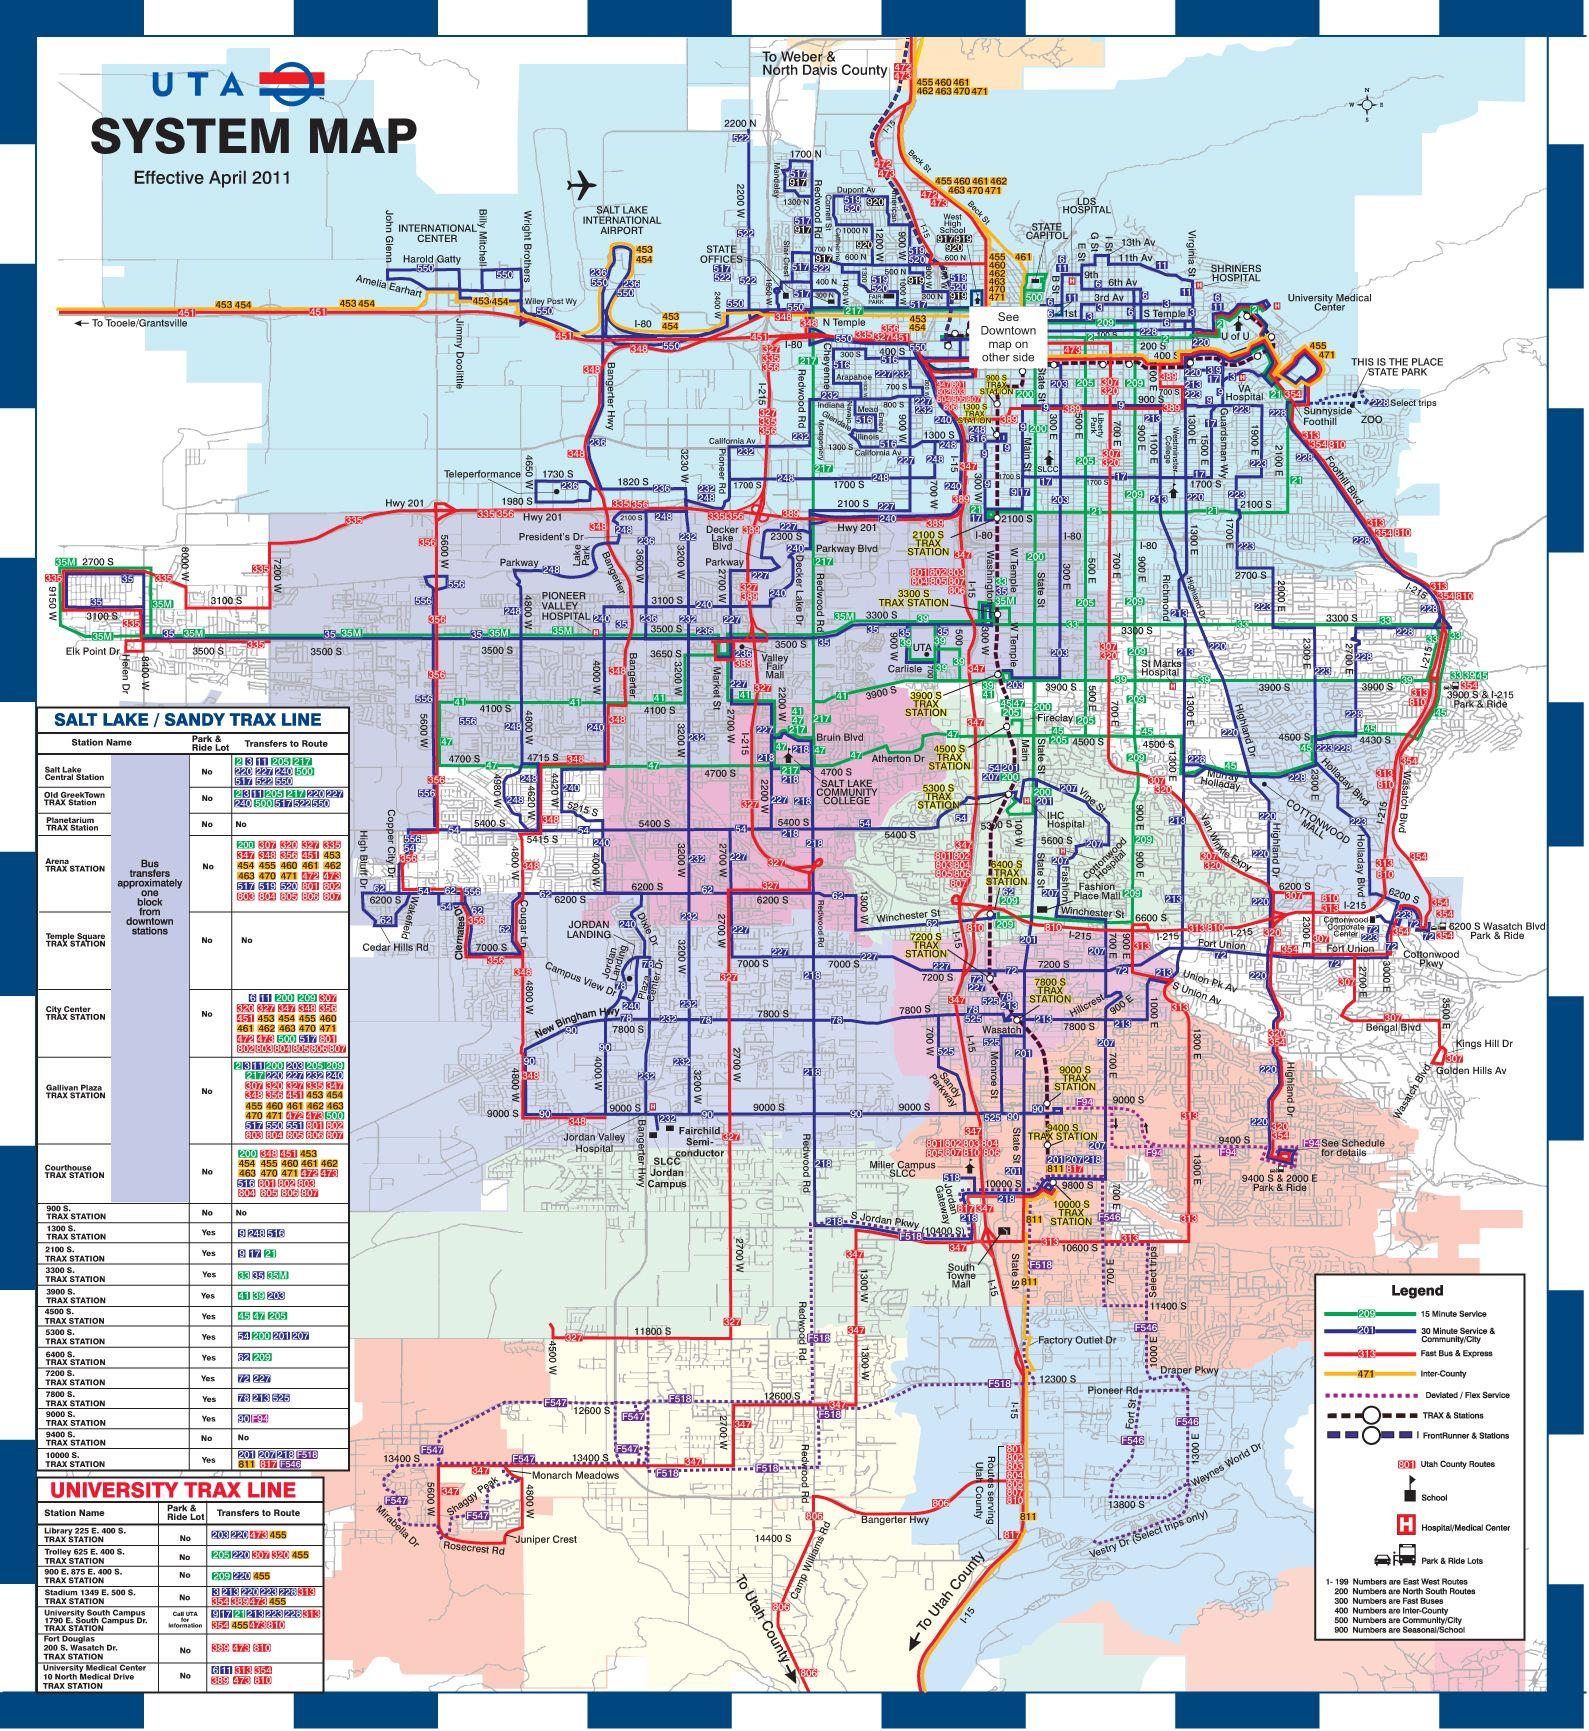 Utah Transit authority map for Salt Lake County #travel #utah ...